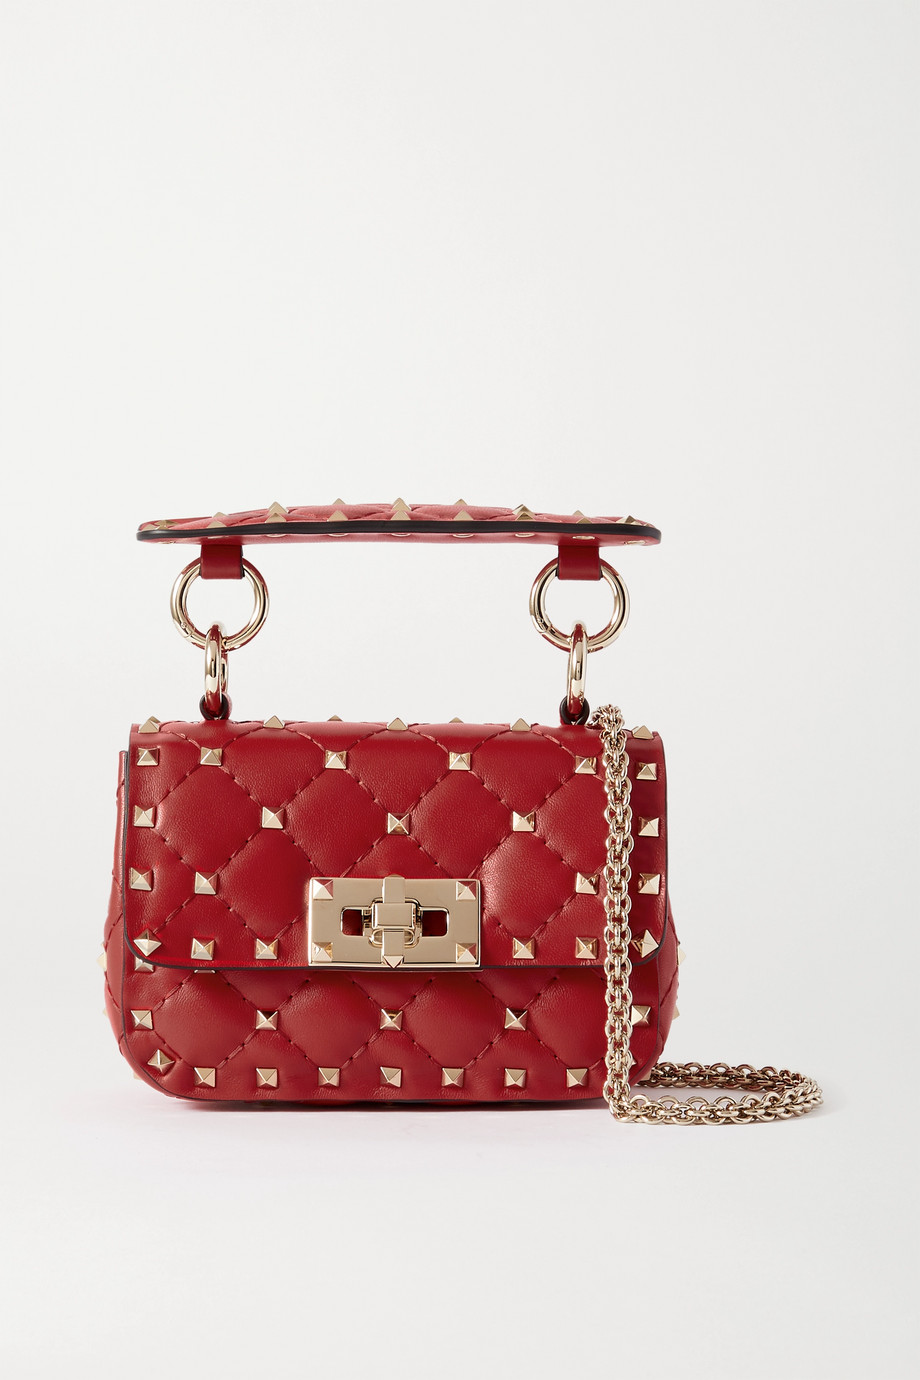 Valentino Valentino Garavani Rockstud Spike micro quilted leather shoulder bag